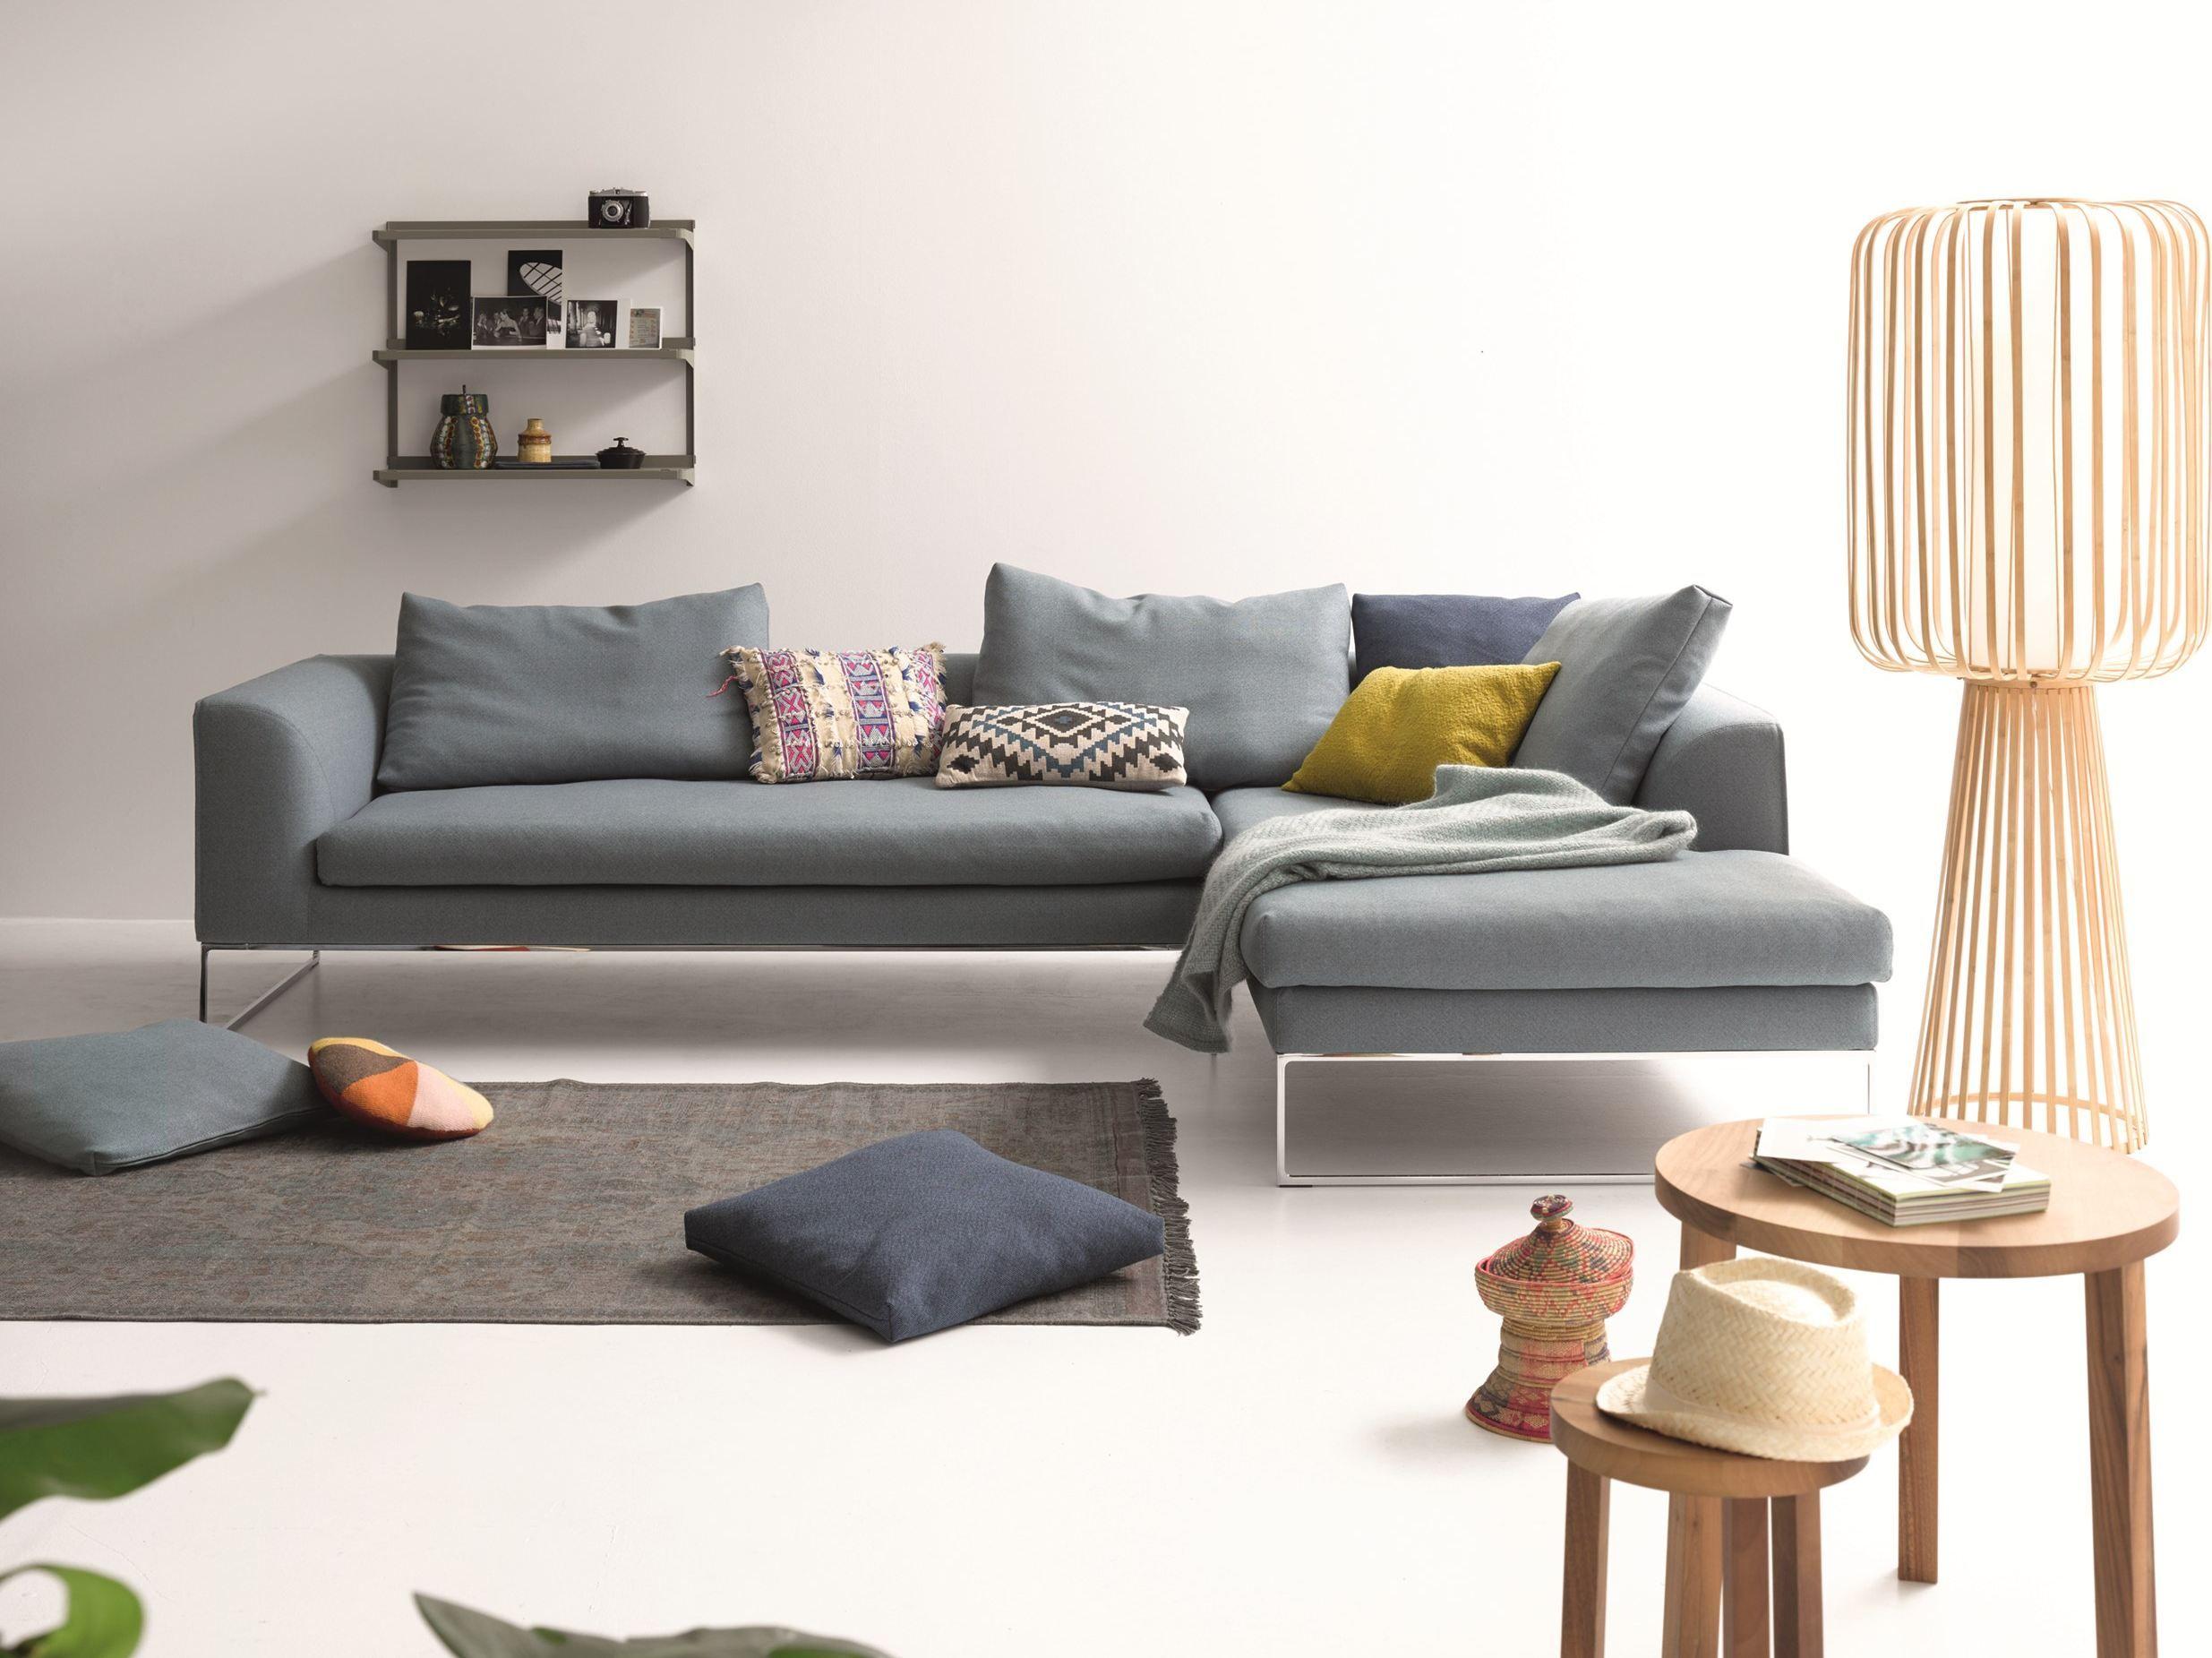 Mell Lounge Sectional Sofa By Cor Sitzmöbel Helmut Lübke